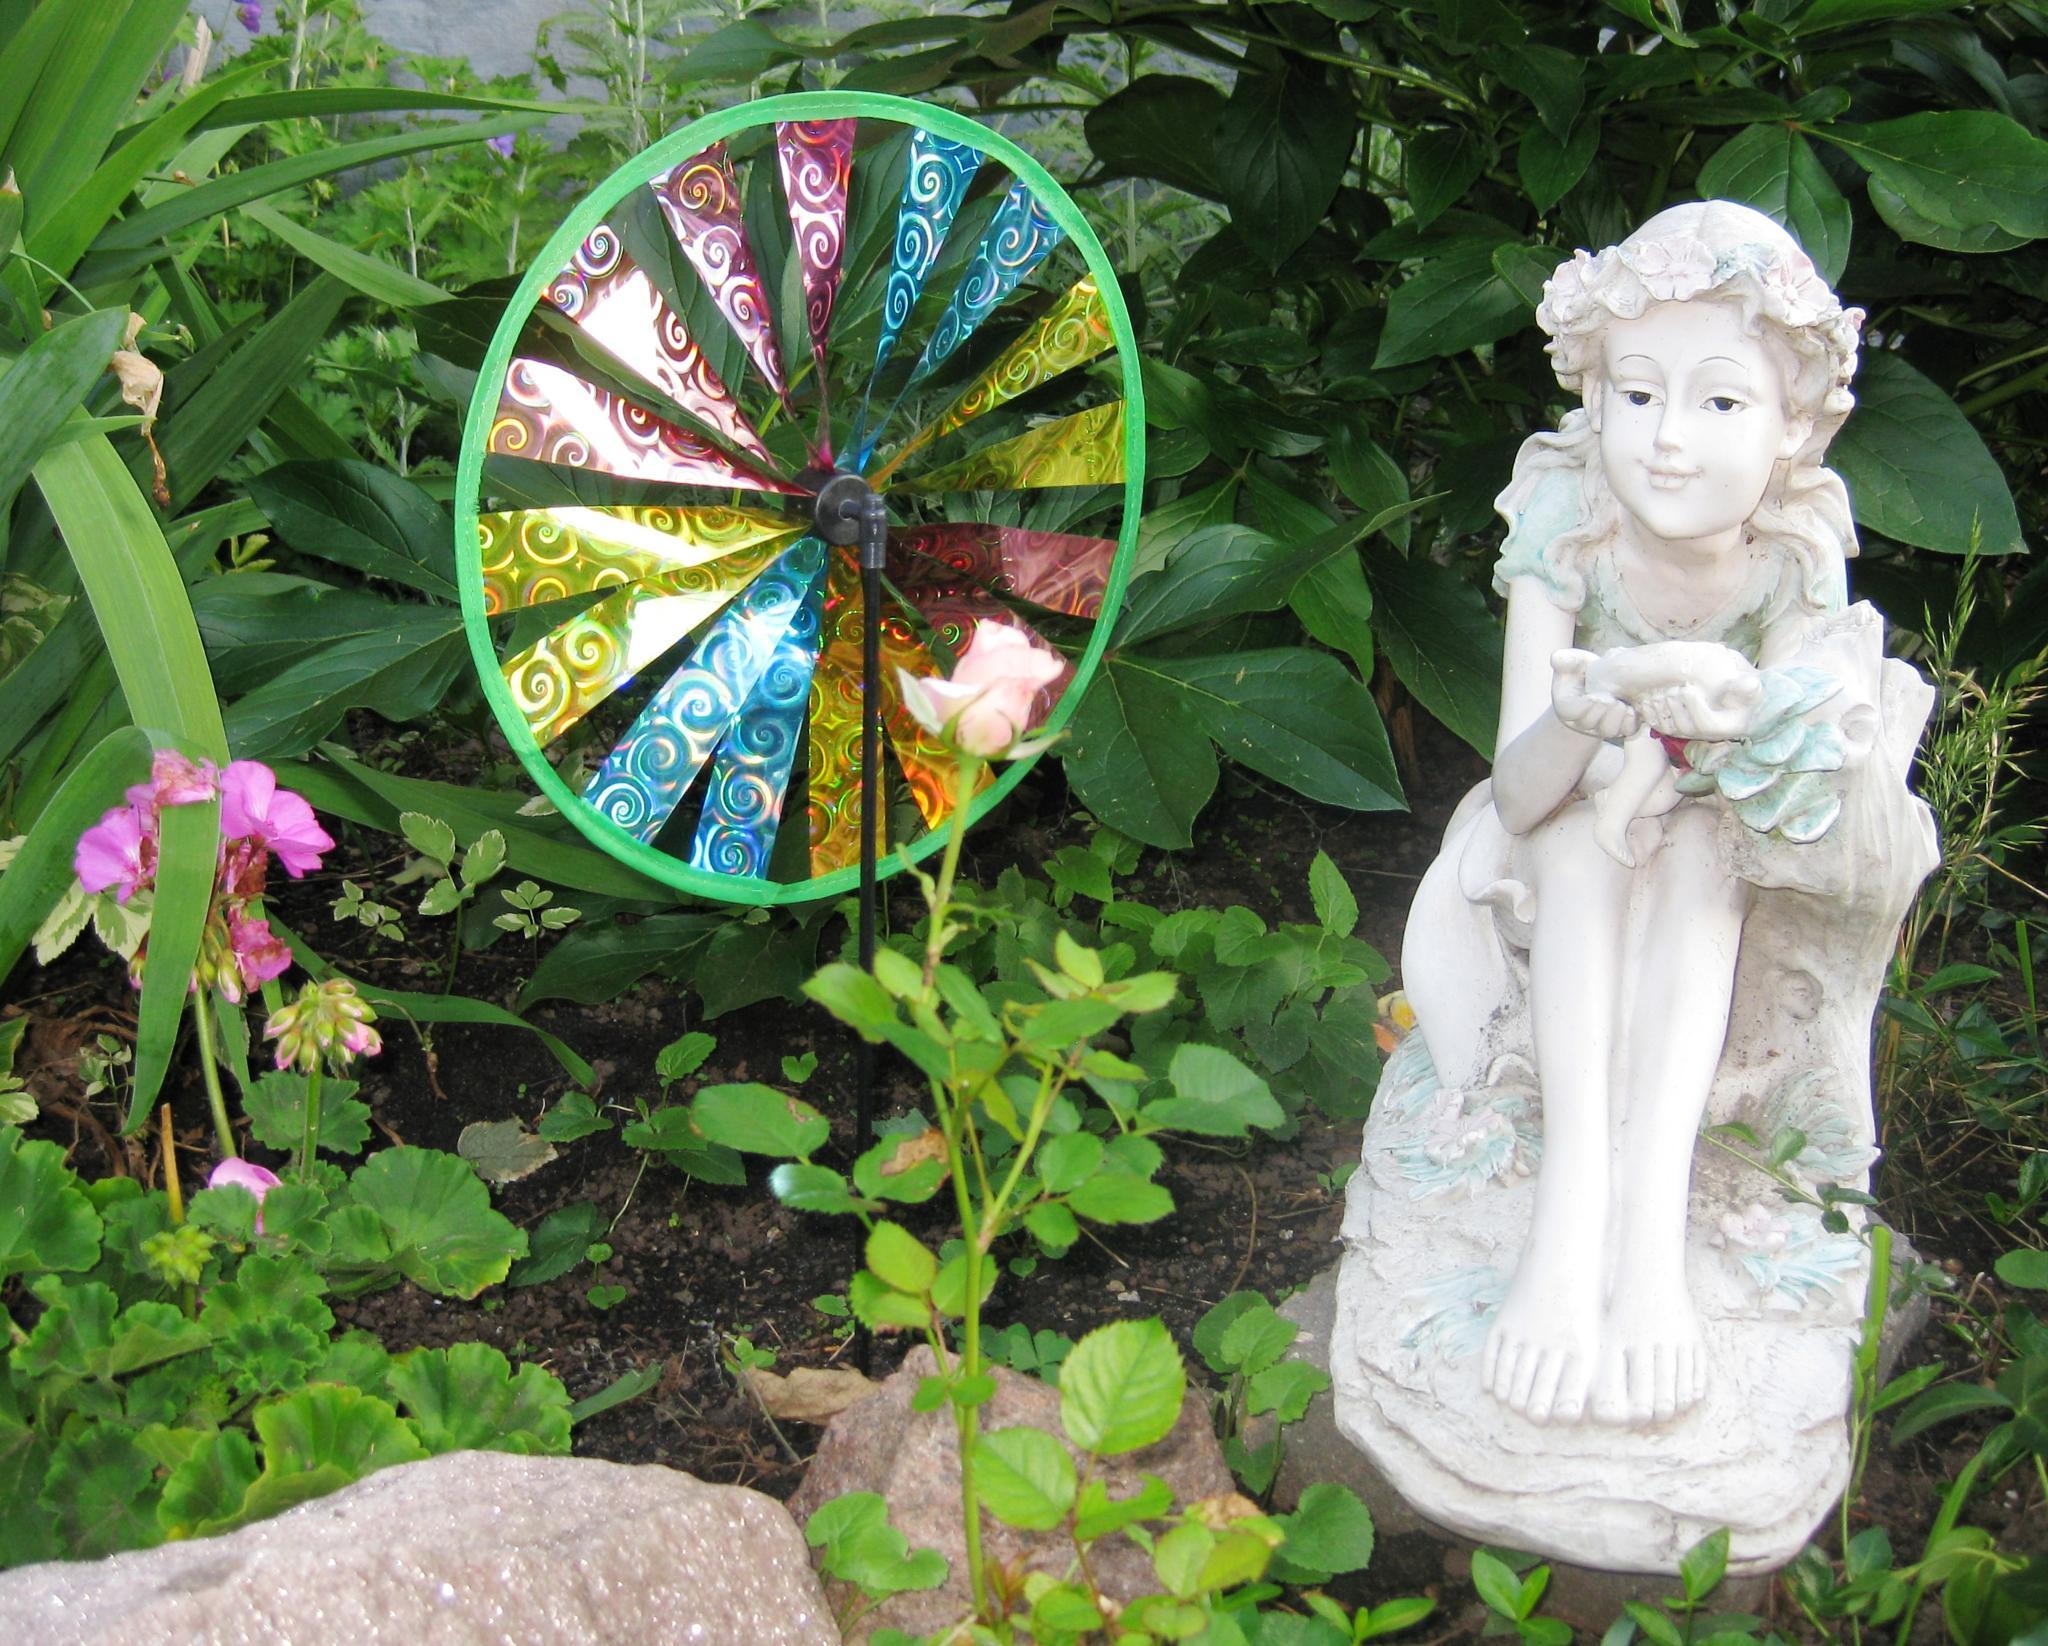 In A Canadian City Garden by sllennips